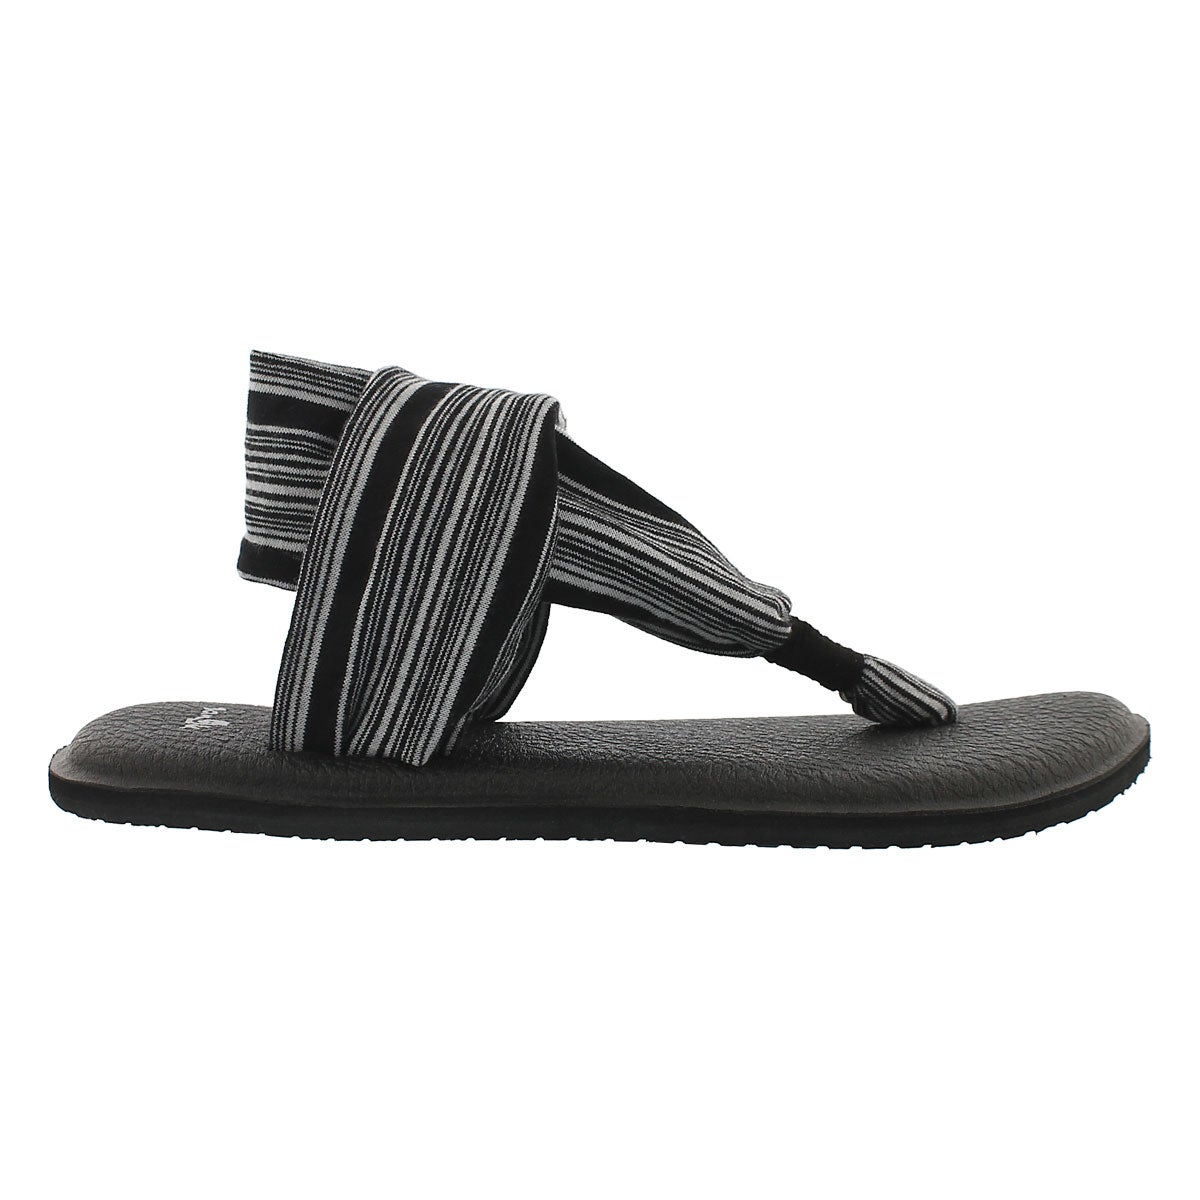 Sandale tong Yoga Sling noir/blanc, fem